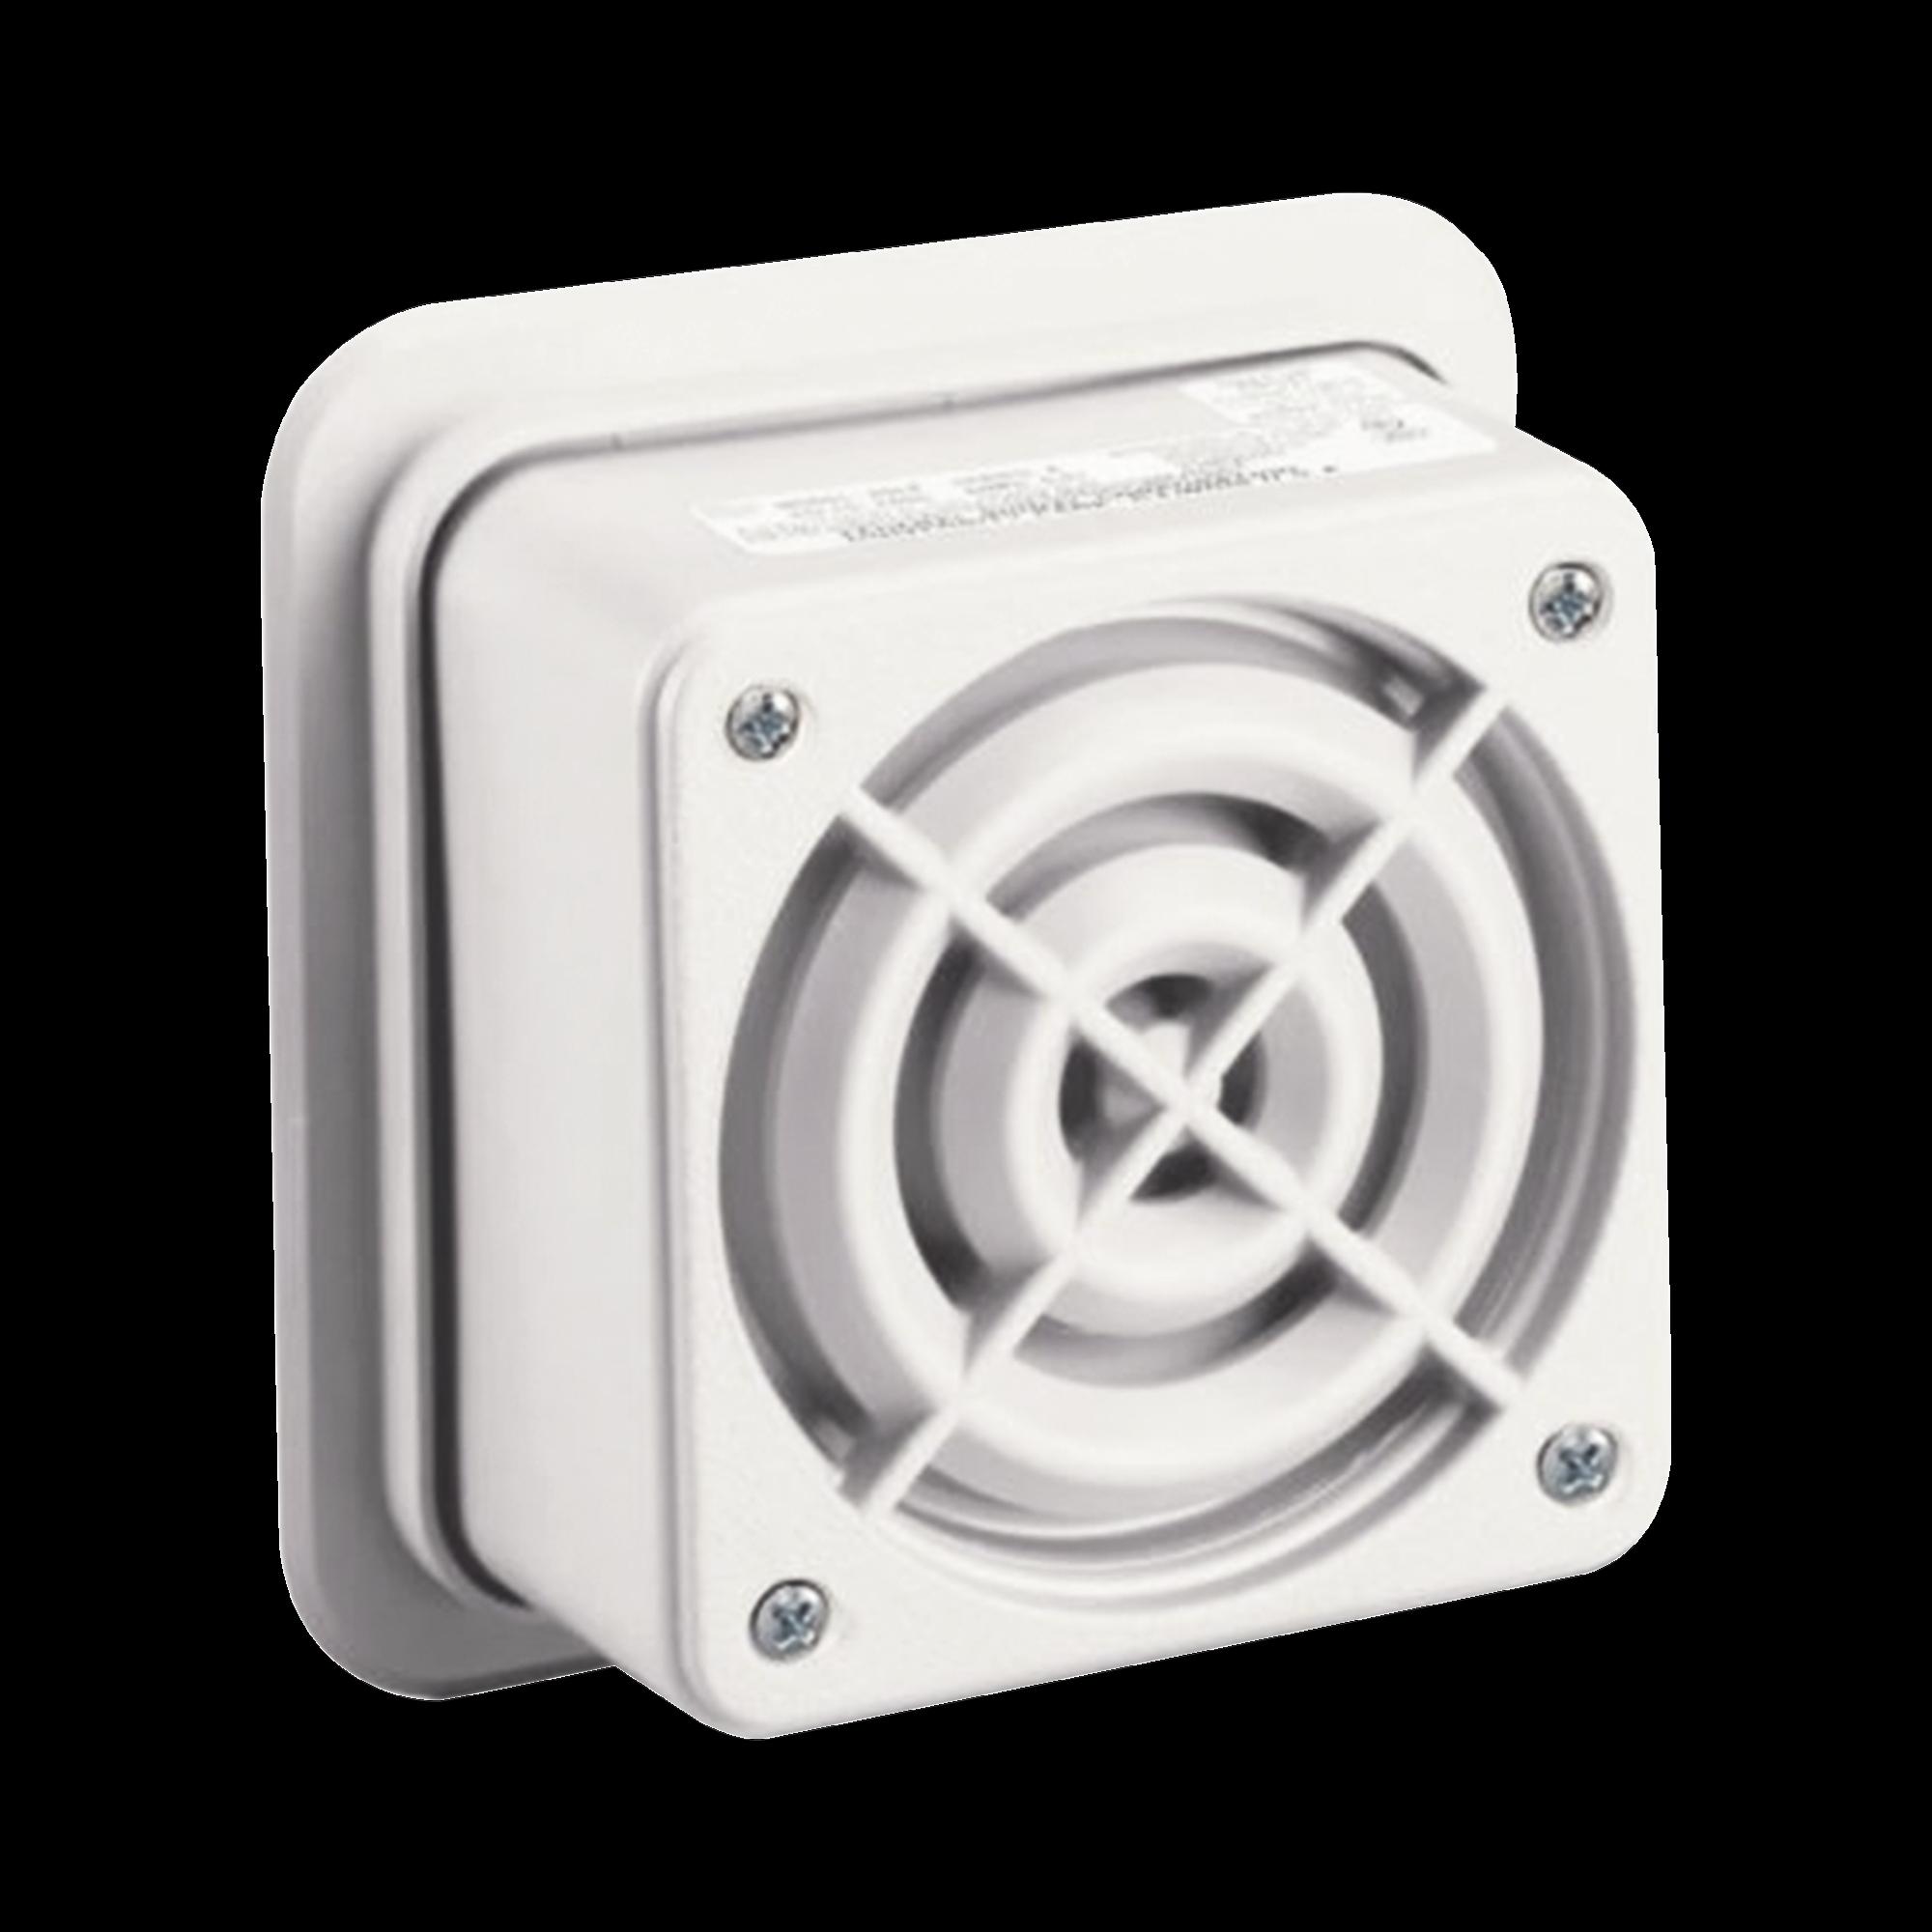 Altavoz de megafonia AudioMaster, 2 W, 25 Vrms, altavoz reentrante, UL Fire, Beige